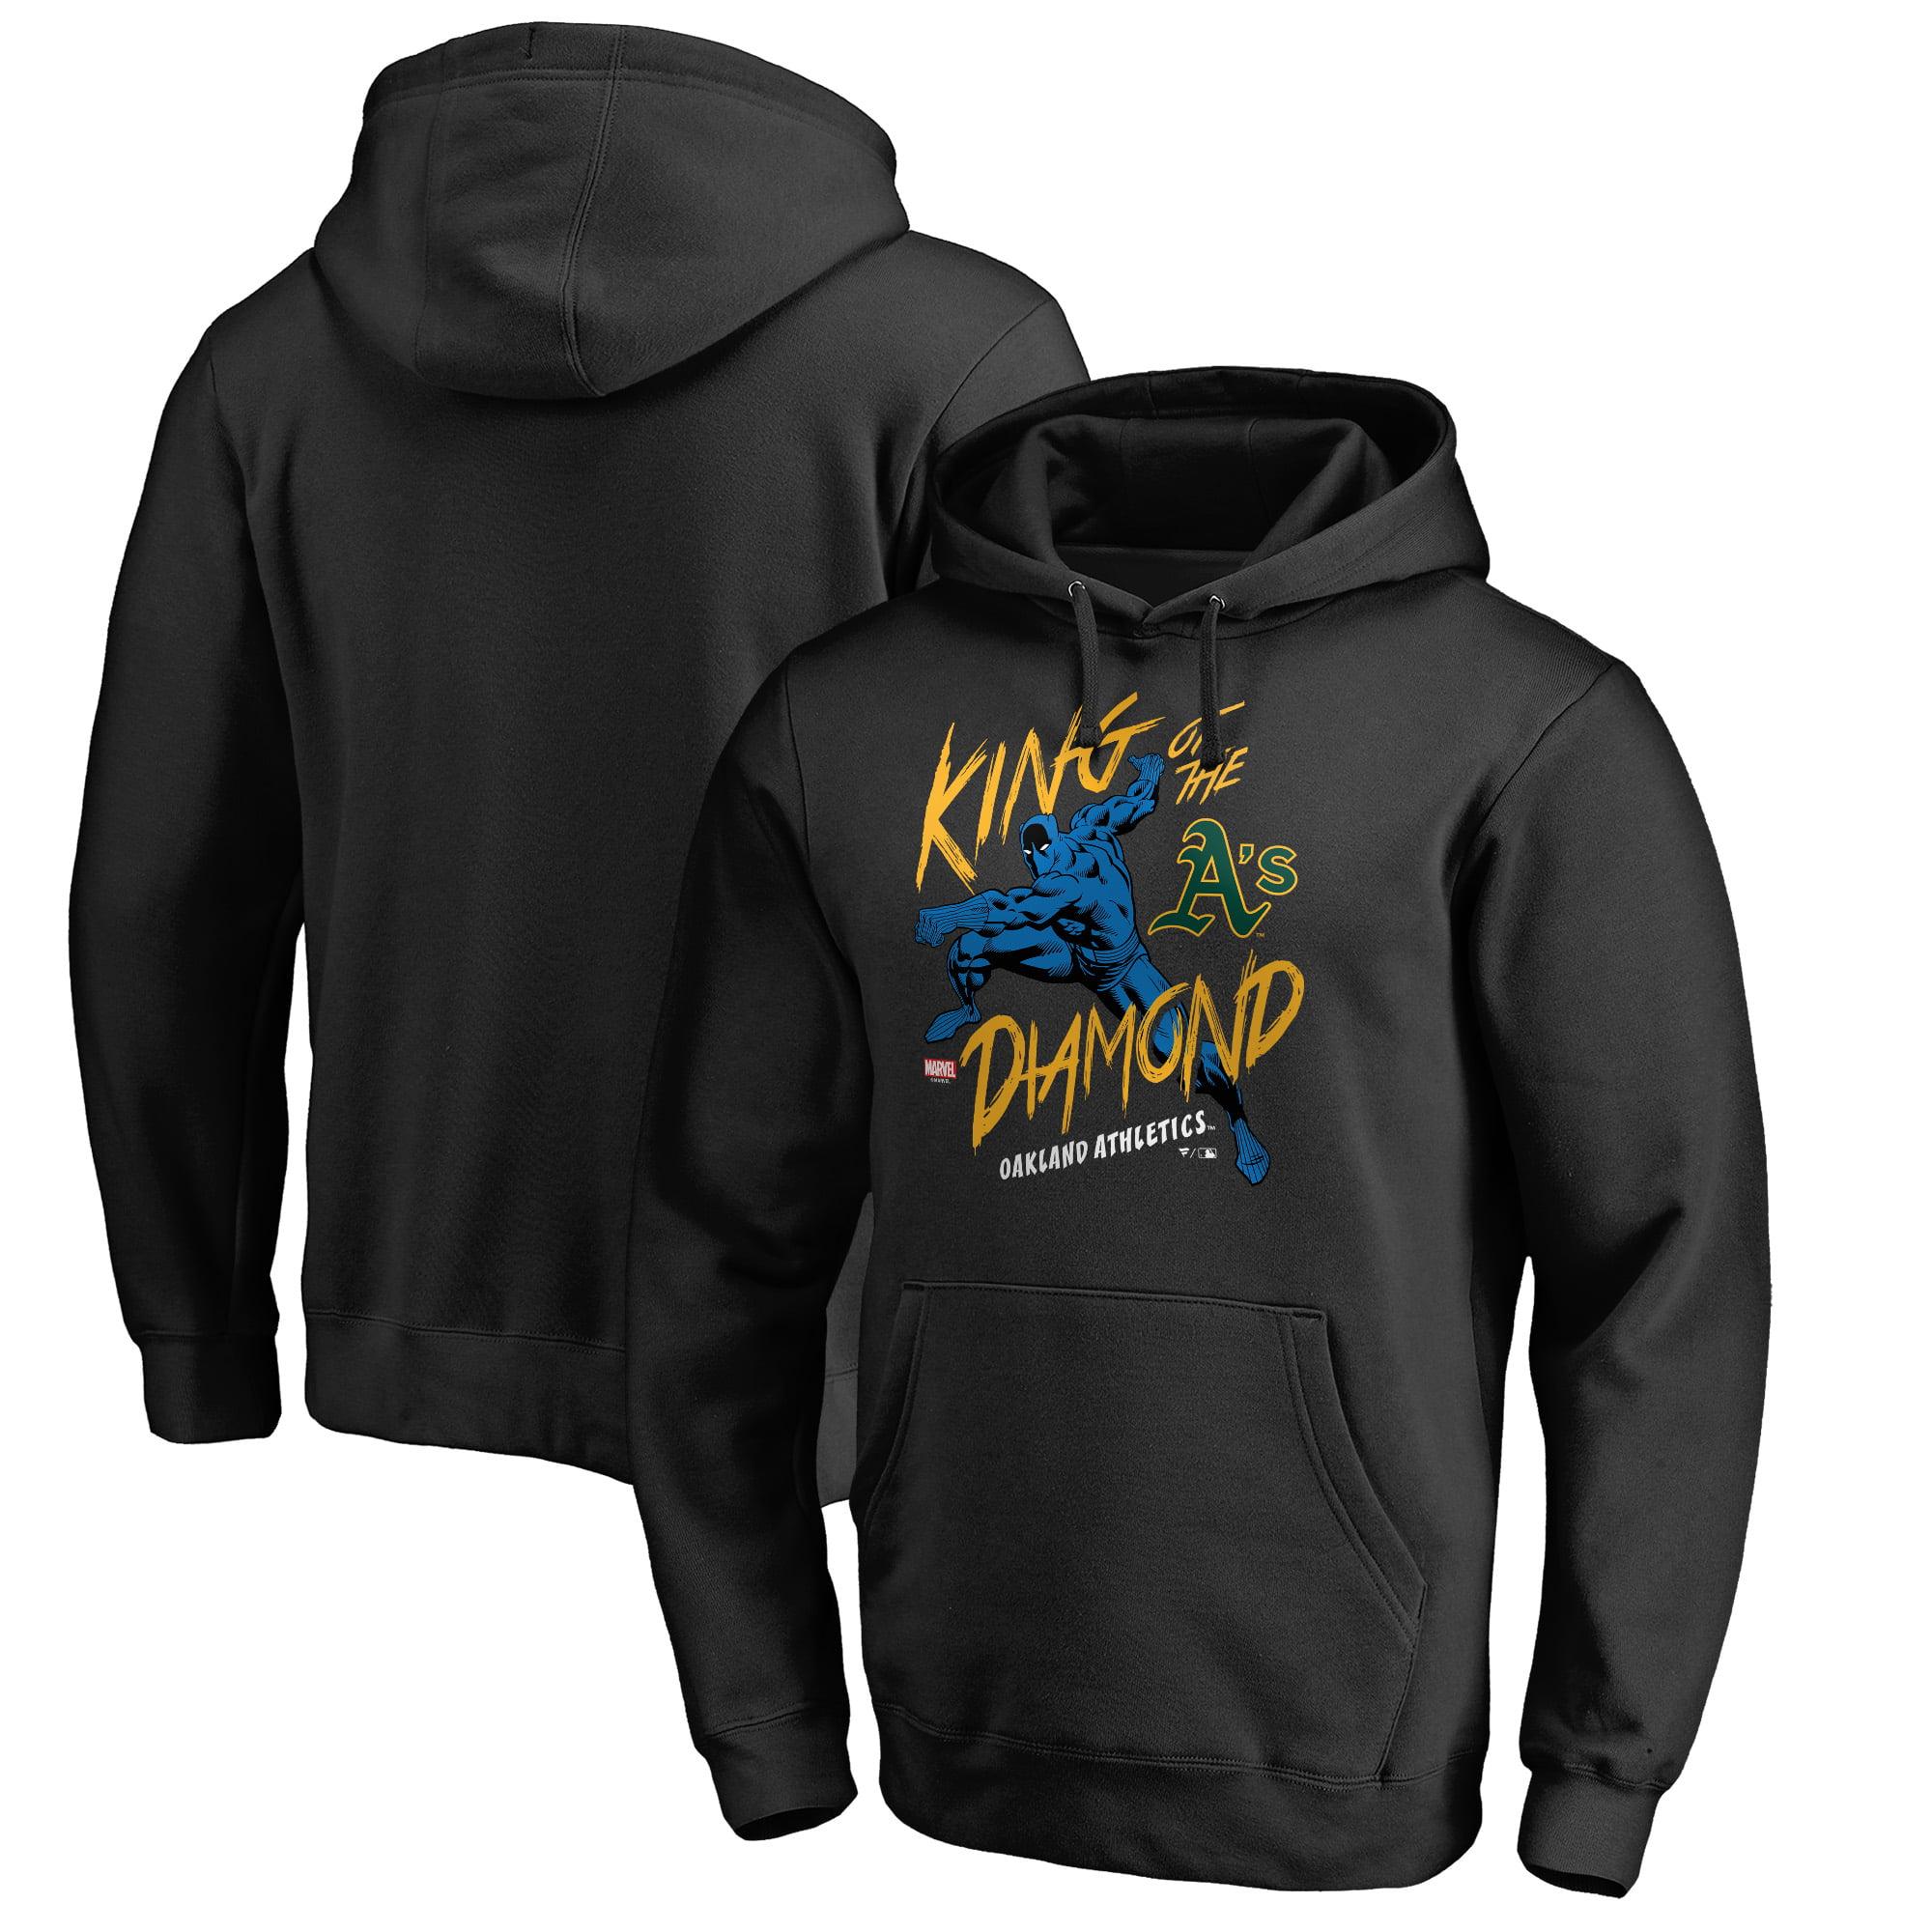 Oakland Athletics Fanatics Branded MLB Marvel Black Panther King of the Diamond Pullover Hoodie - Black